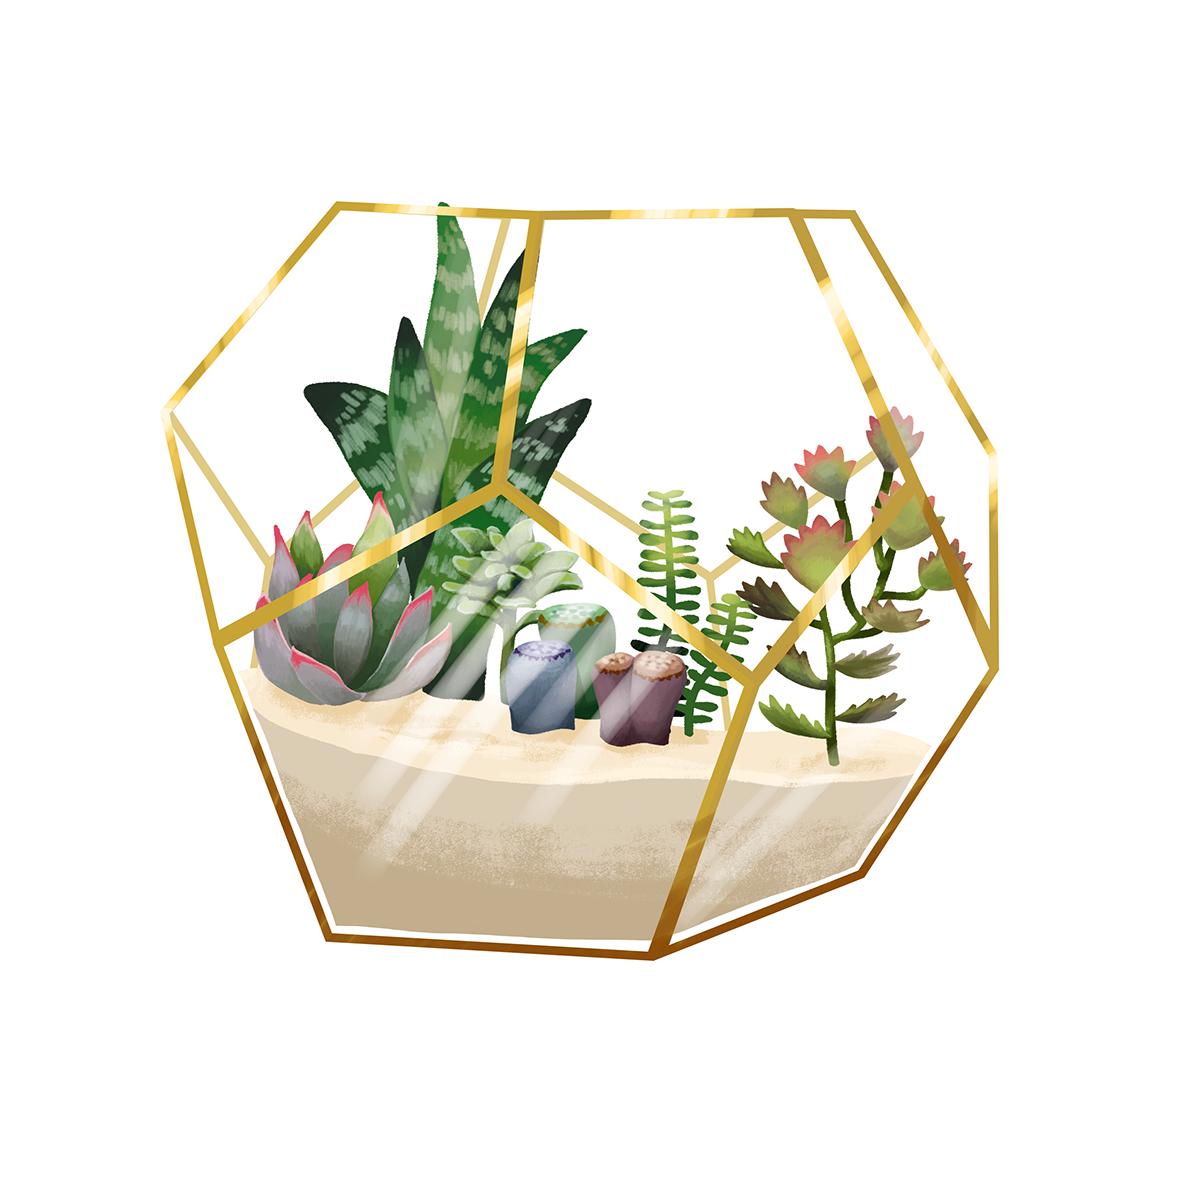 Terrarium With Succulents On Behance